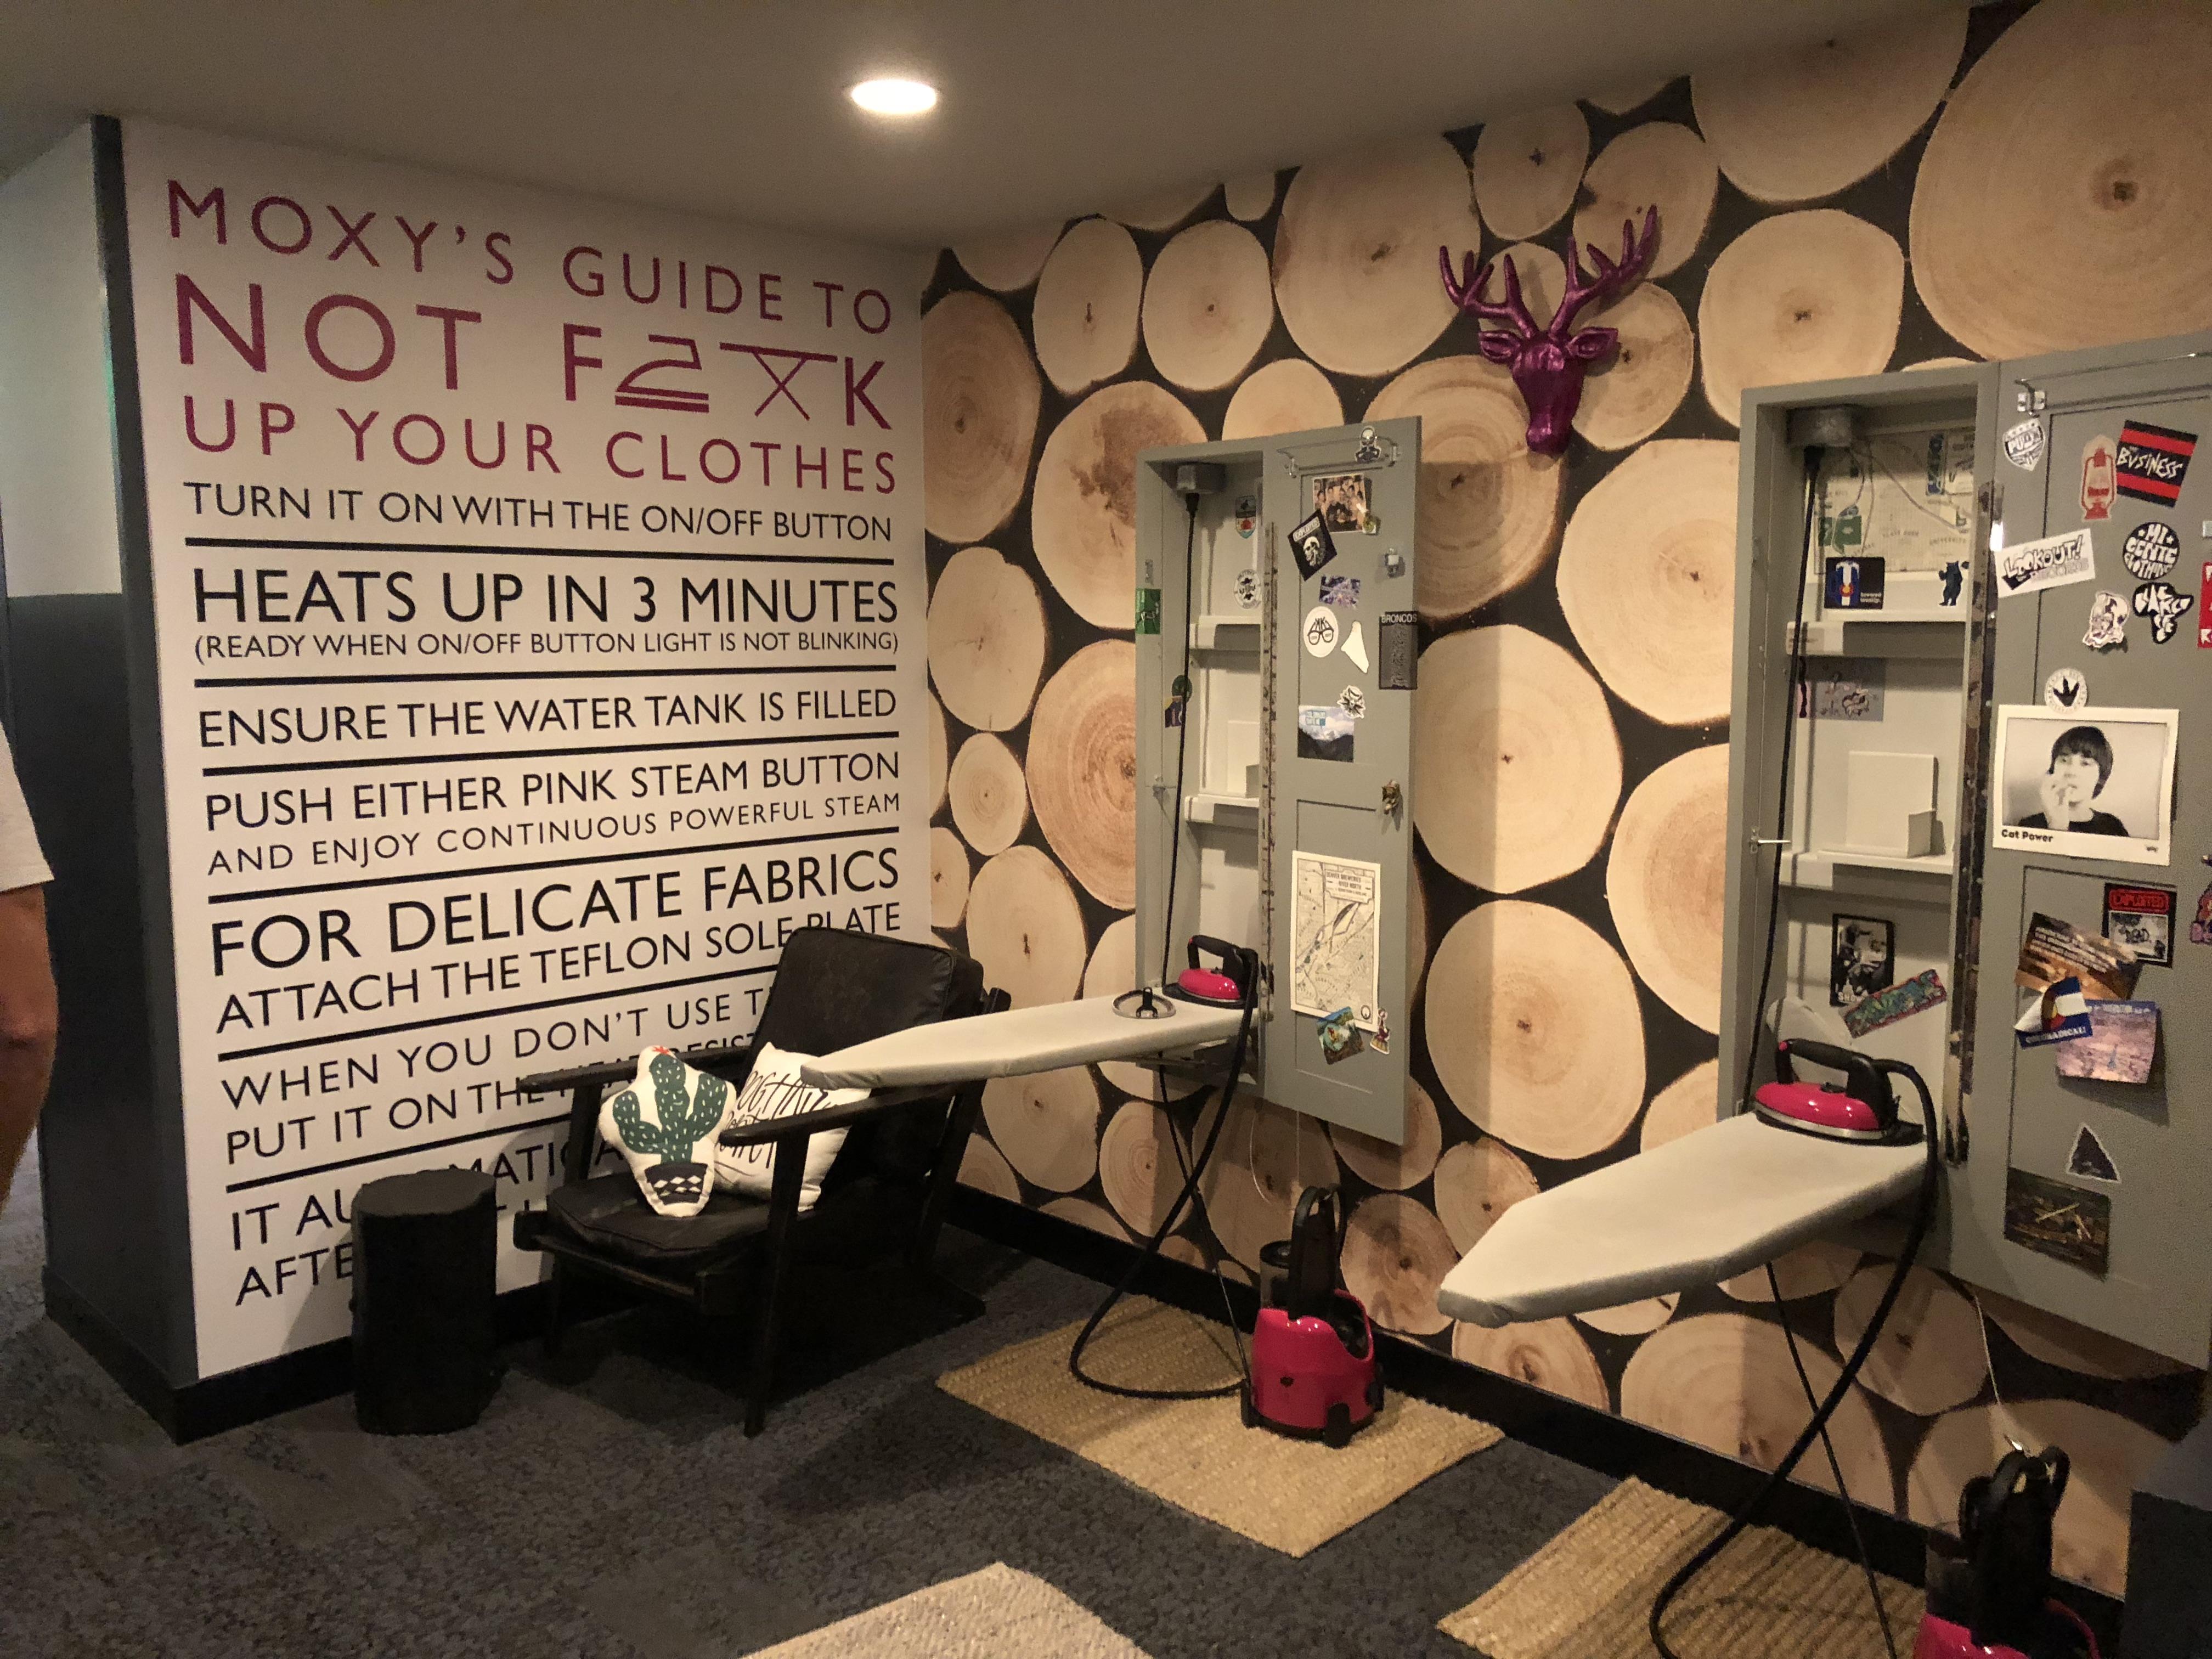 Ironing room at Moxy Cherry Creek Hotel in Denver, Colorado